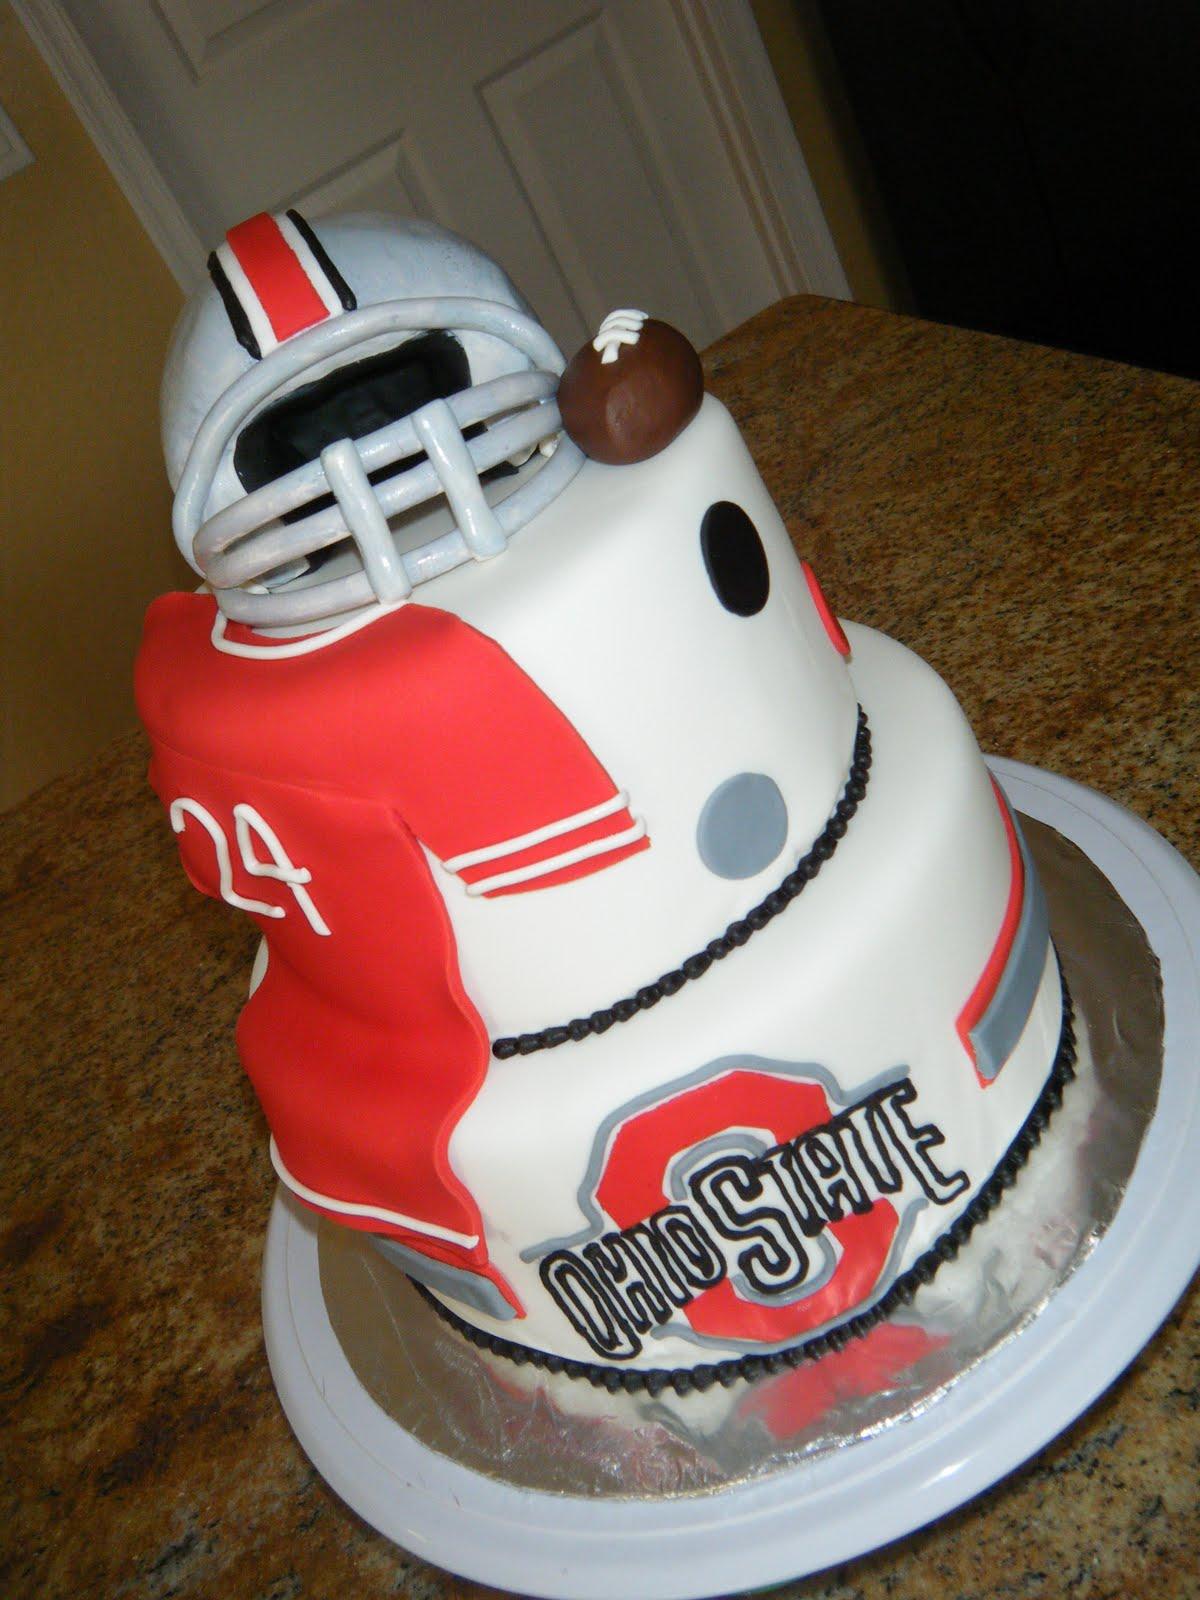 Cassy S Cakes Ohio State Football Cake